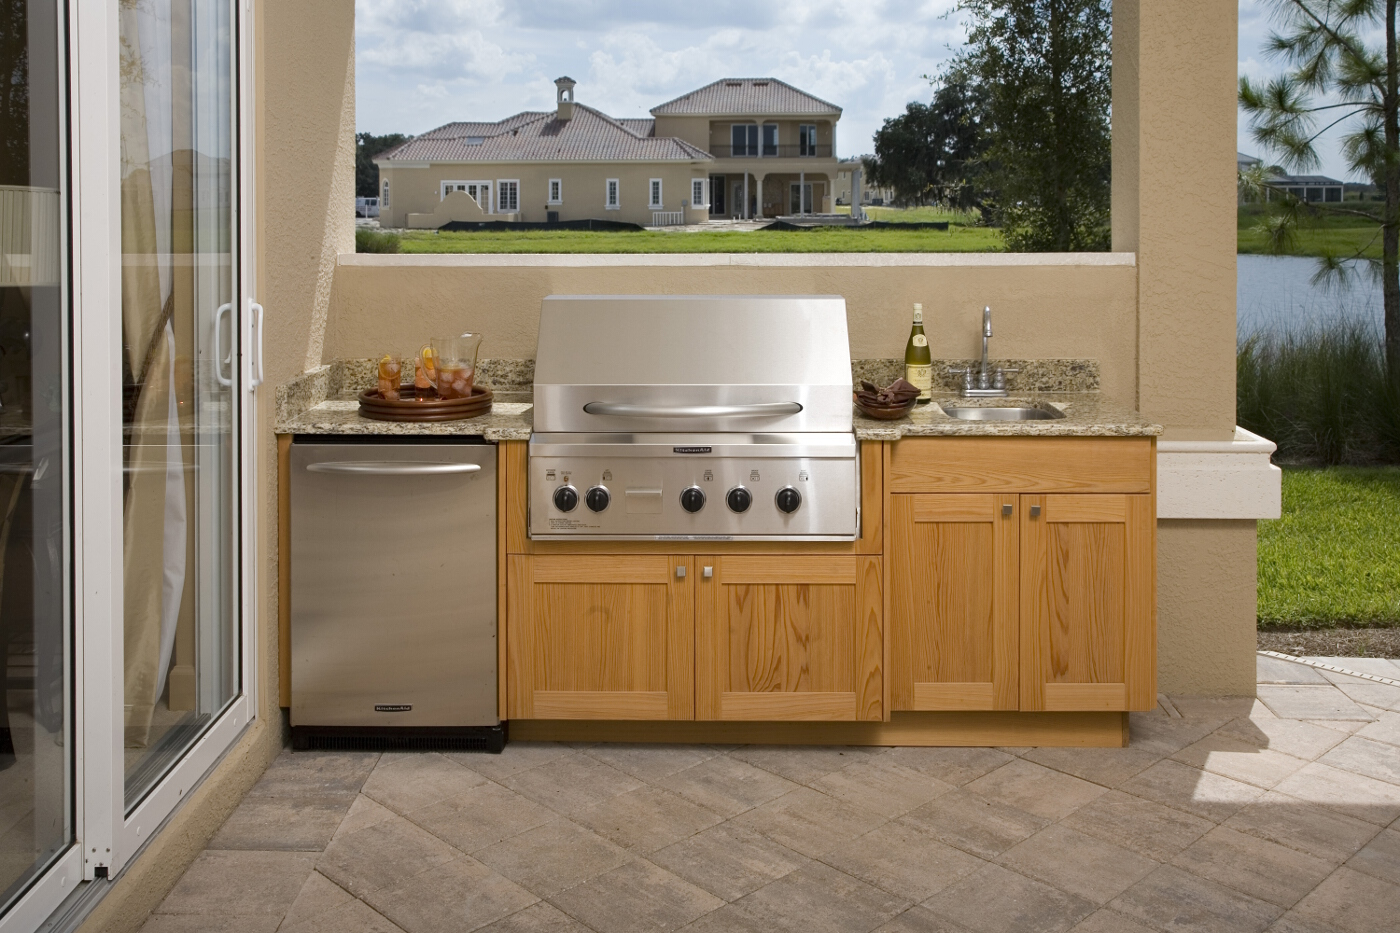 Outdoor Kitchens Da Vinci Cabinetry Bonita Springs, FL